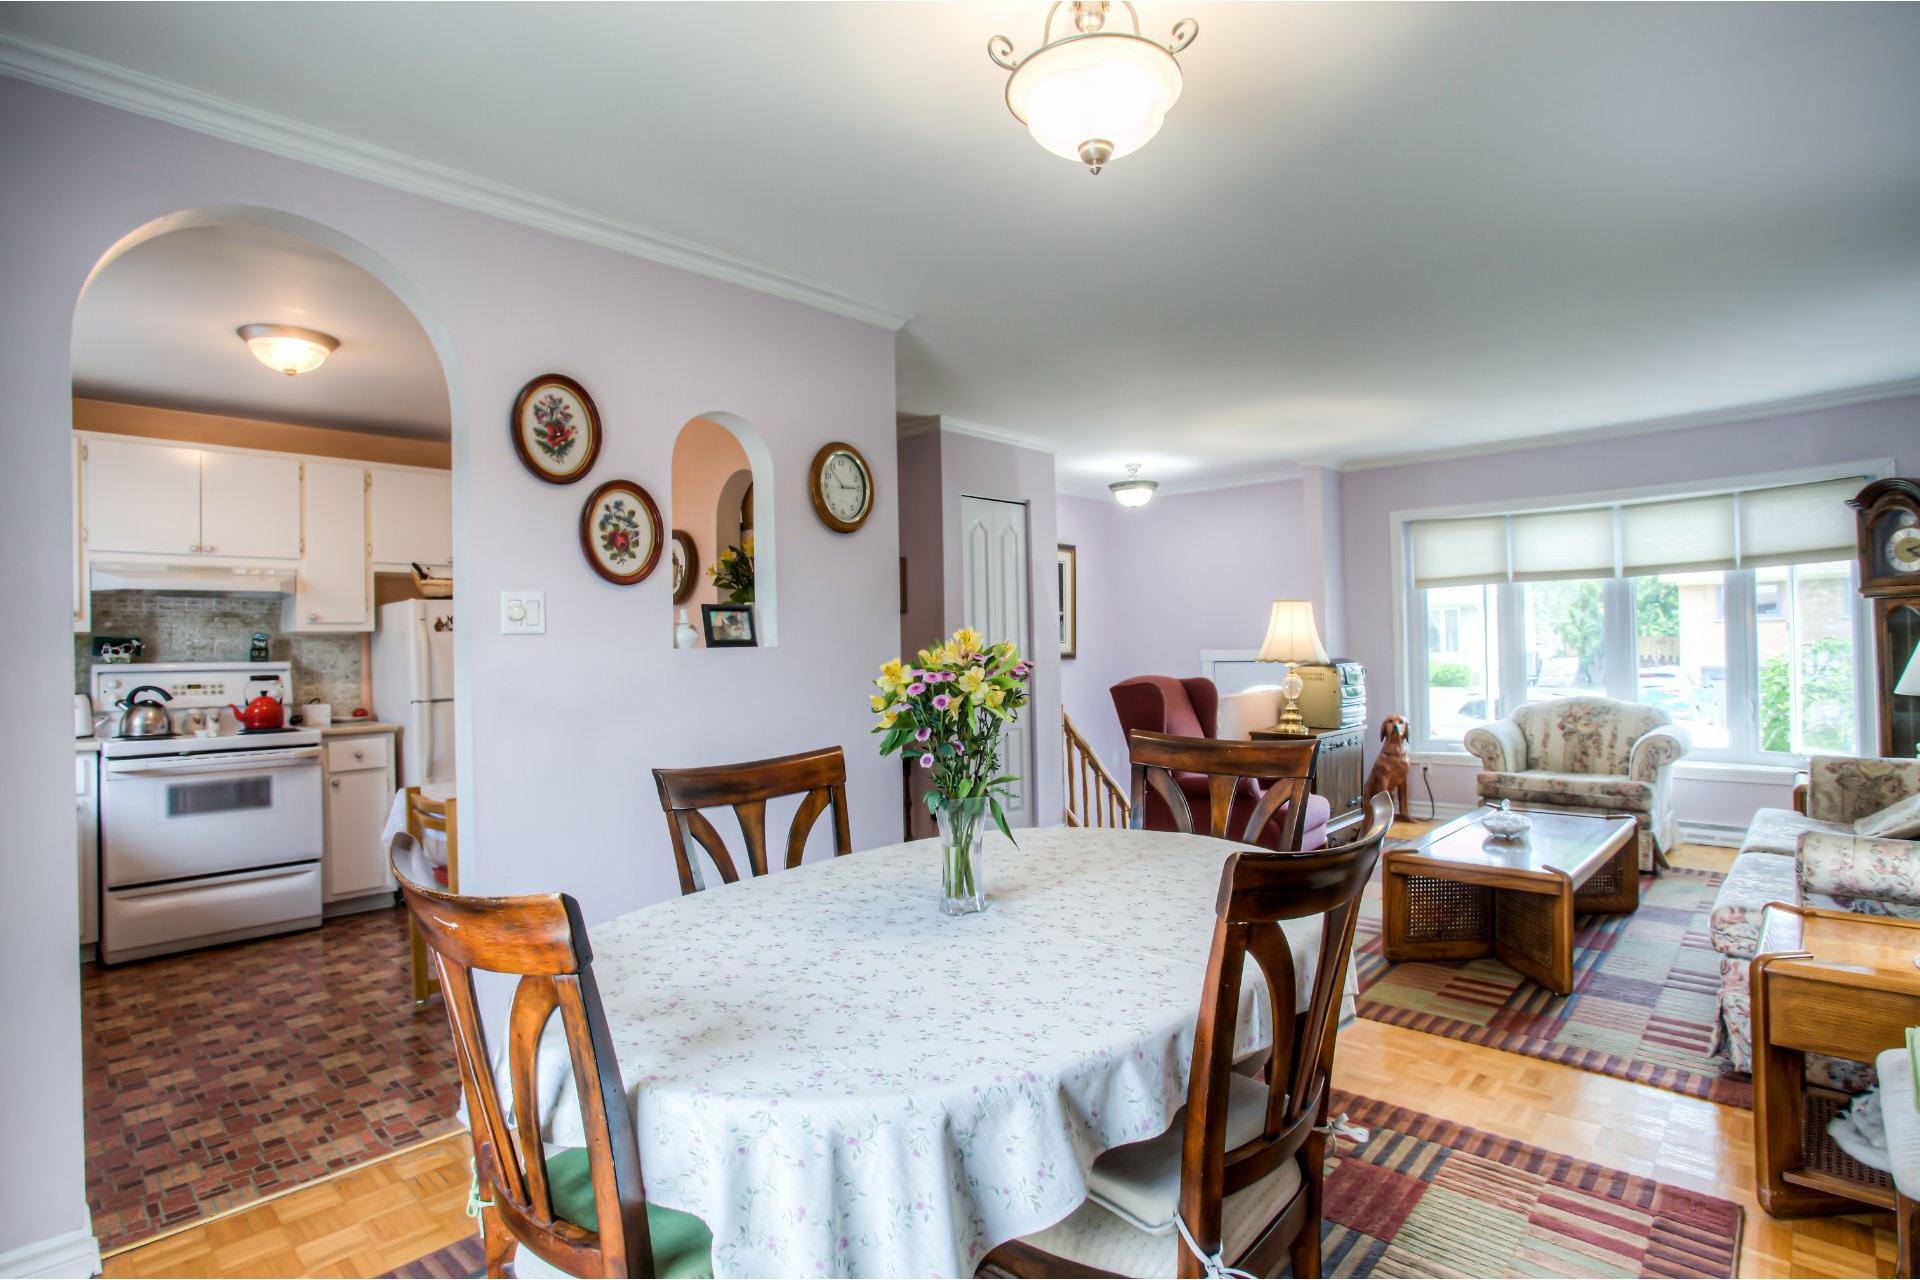 image 7 - House For sale Pierrefonds-Roxboro Montréal  - 10 rooms